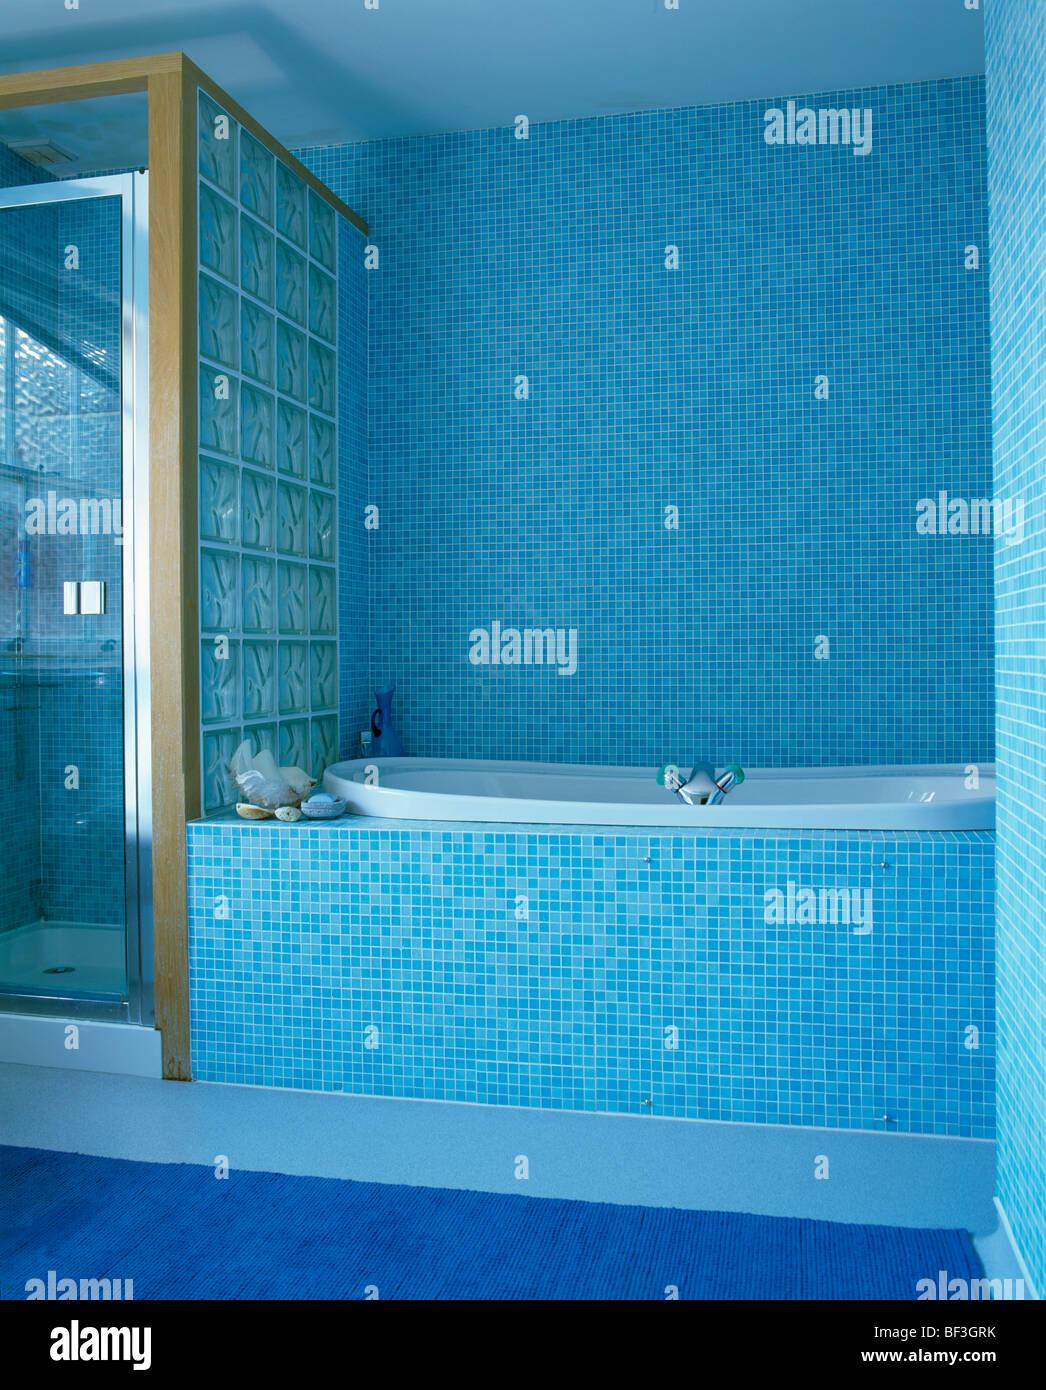 Moderno cuarto de ba o con azulejos de mosaico azul pared de ladrillos de vidrio divisoria de - Azulejos mosaico bano ...